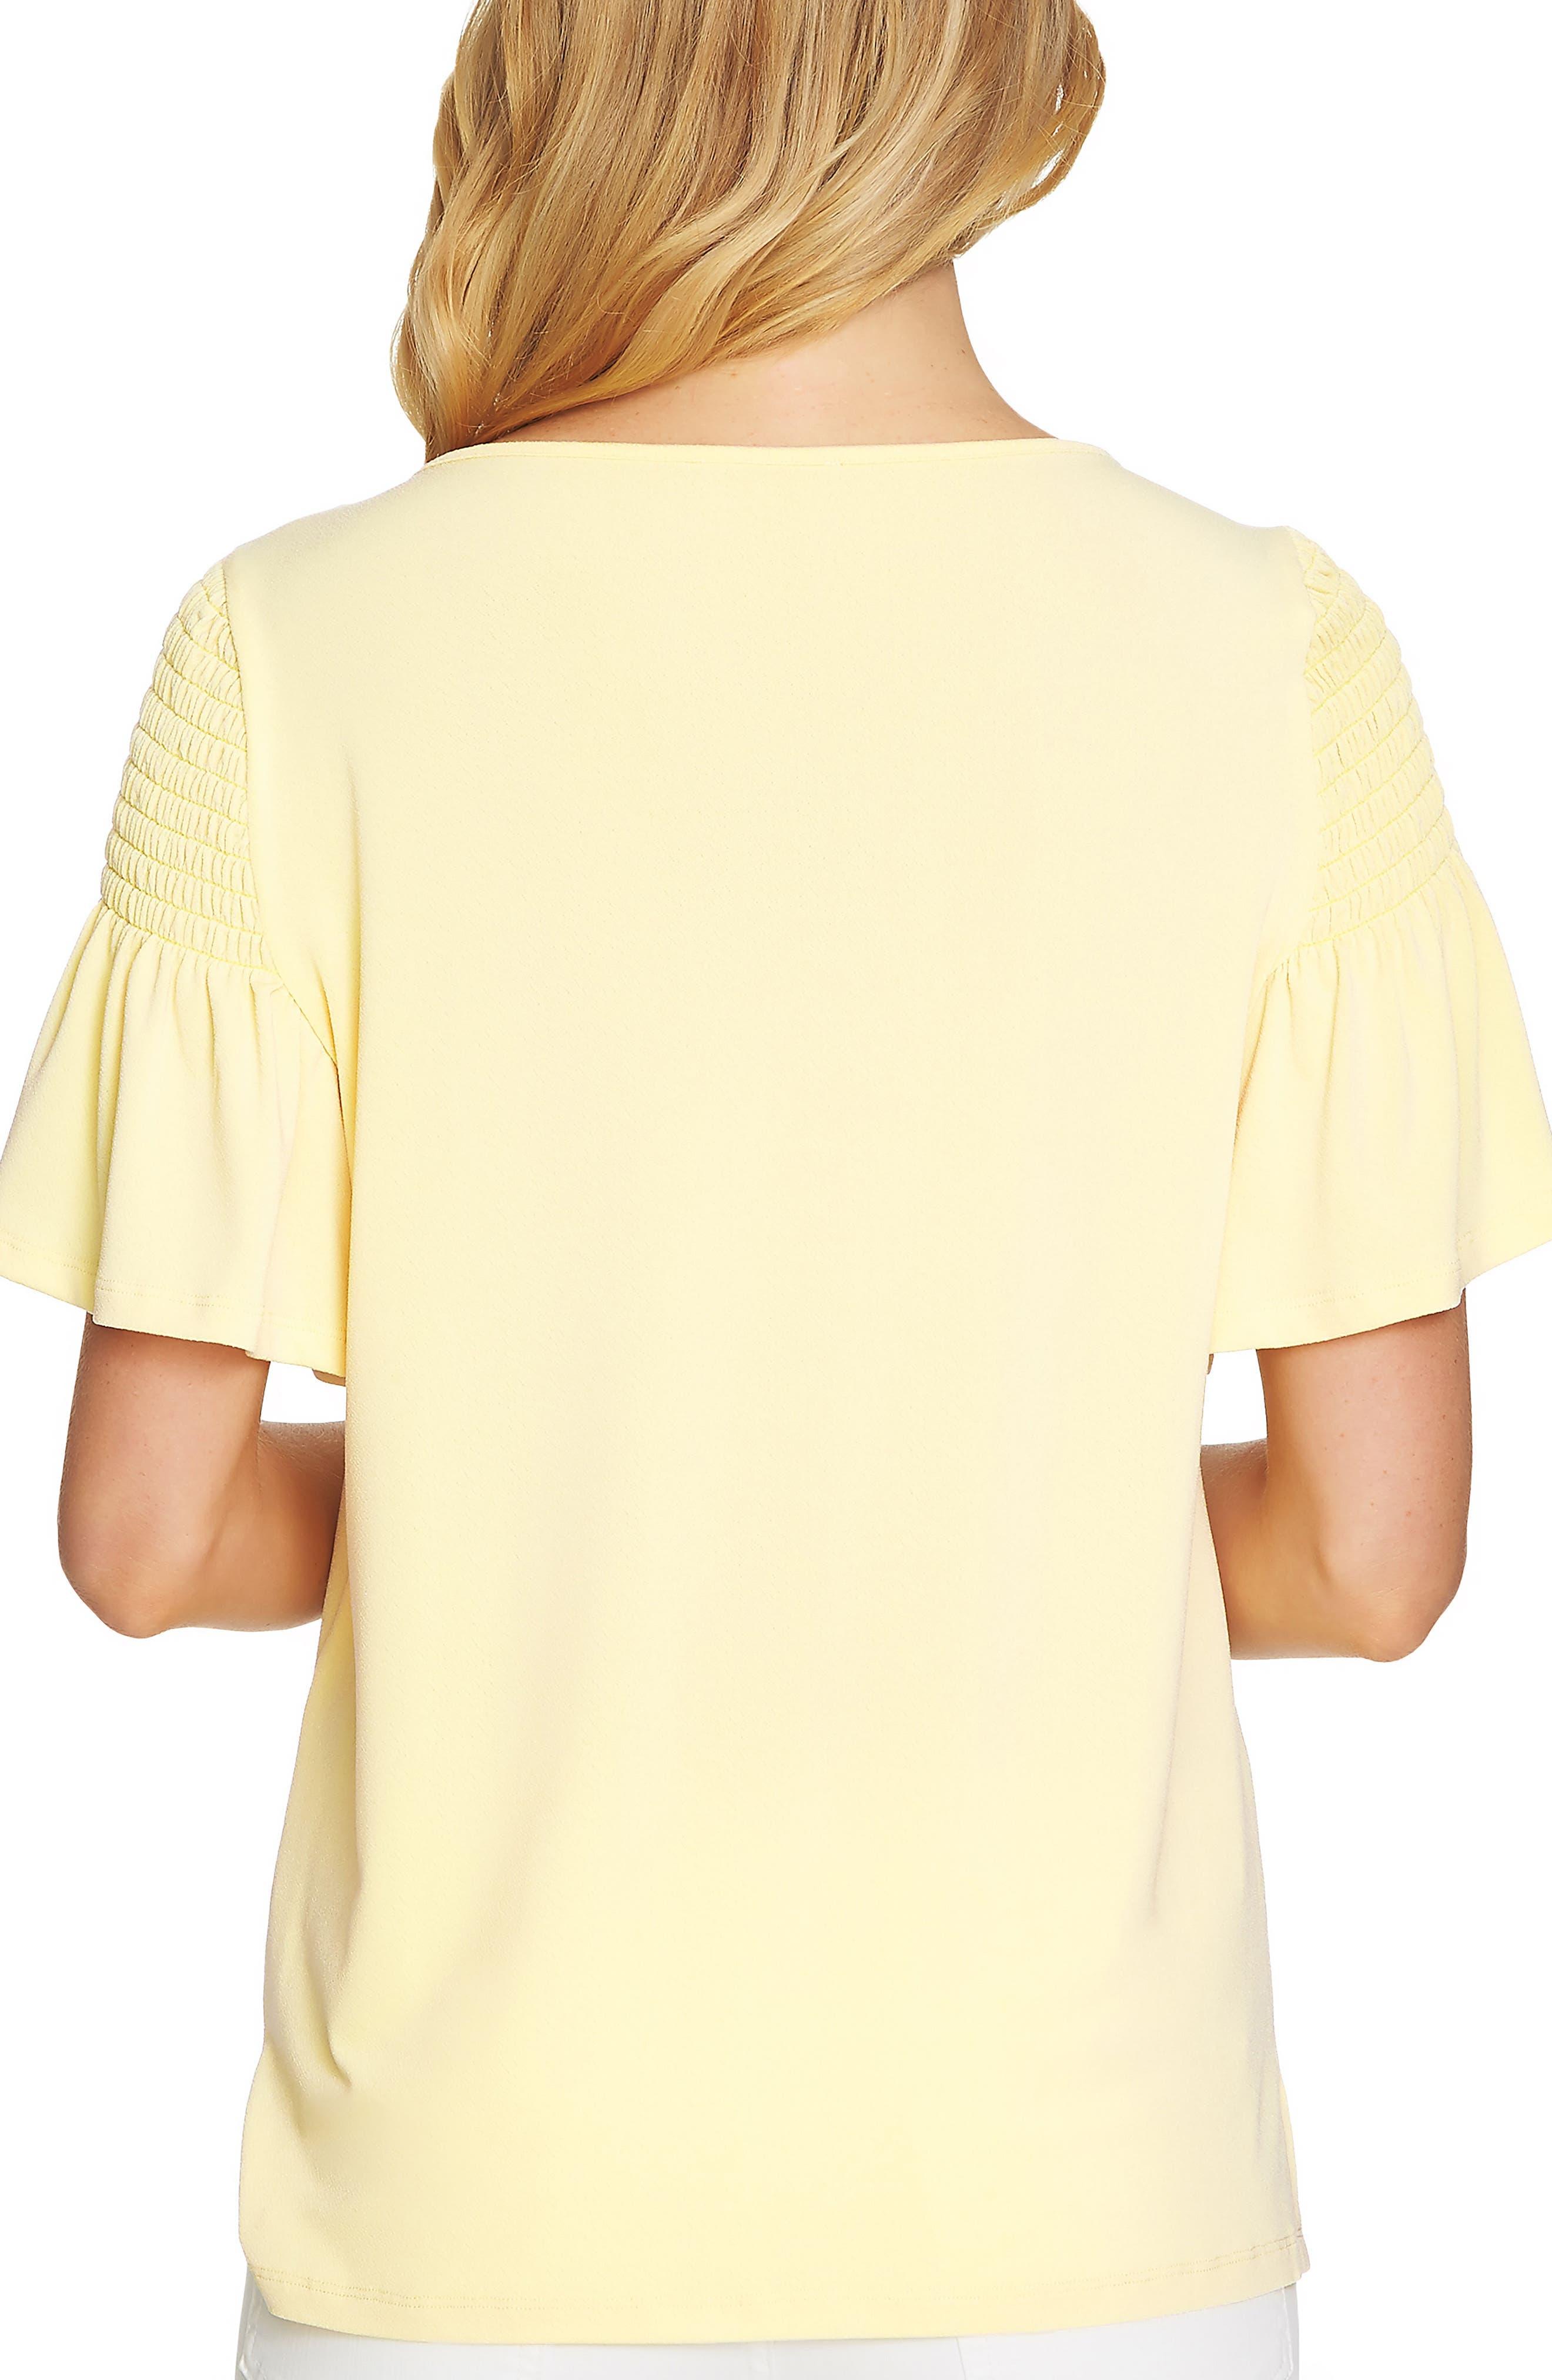 Flutter Sleeve Crepe Top,                             Alternate thumbnail 2, color,                             729